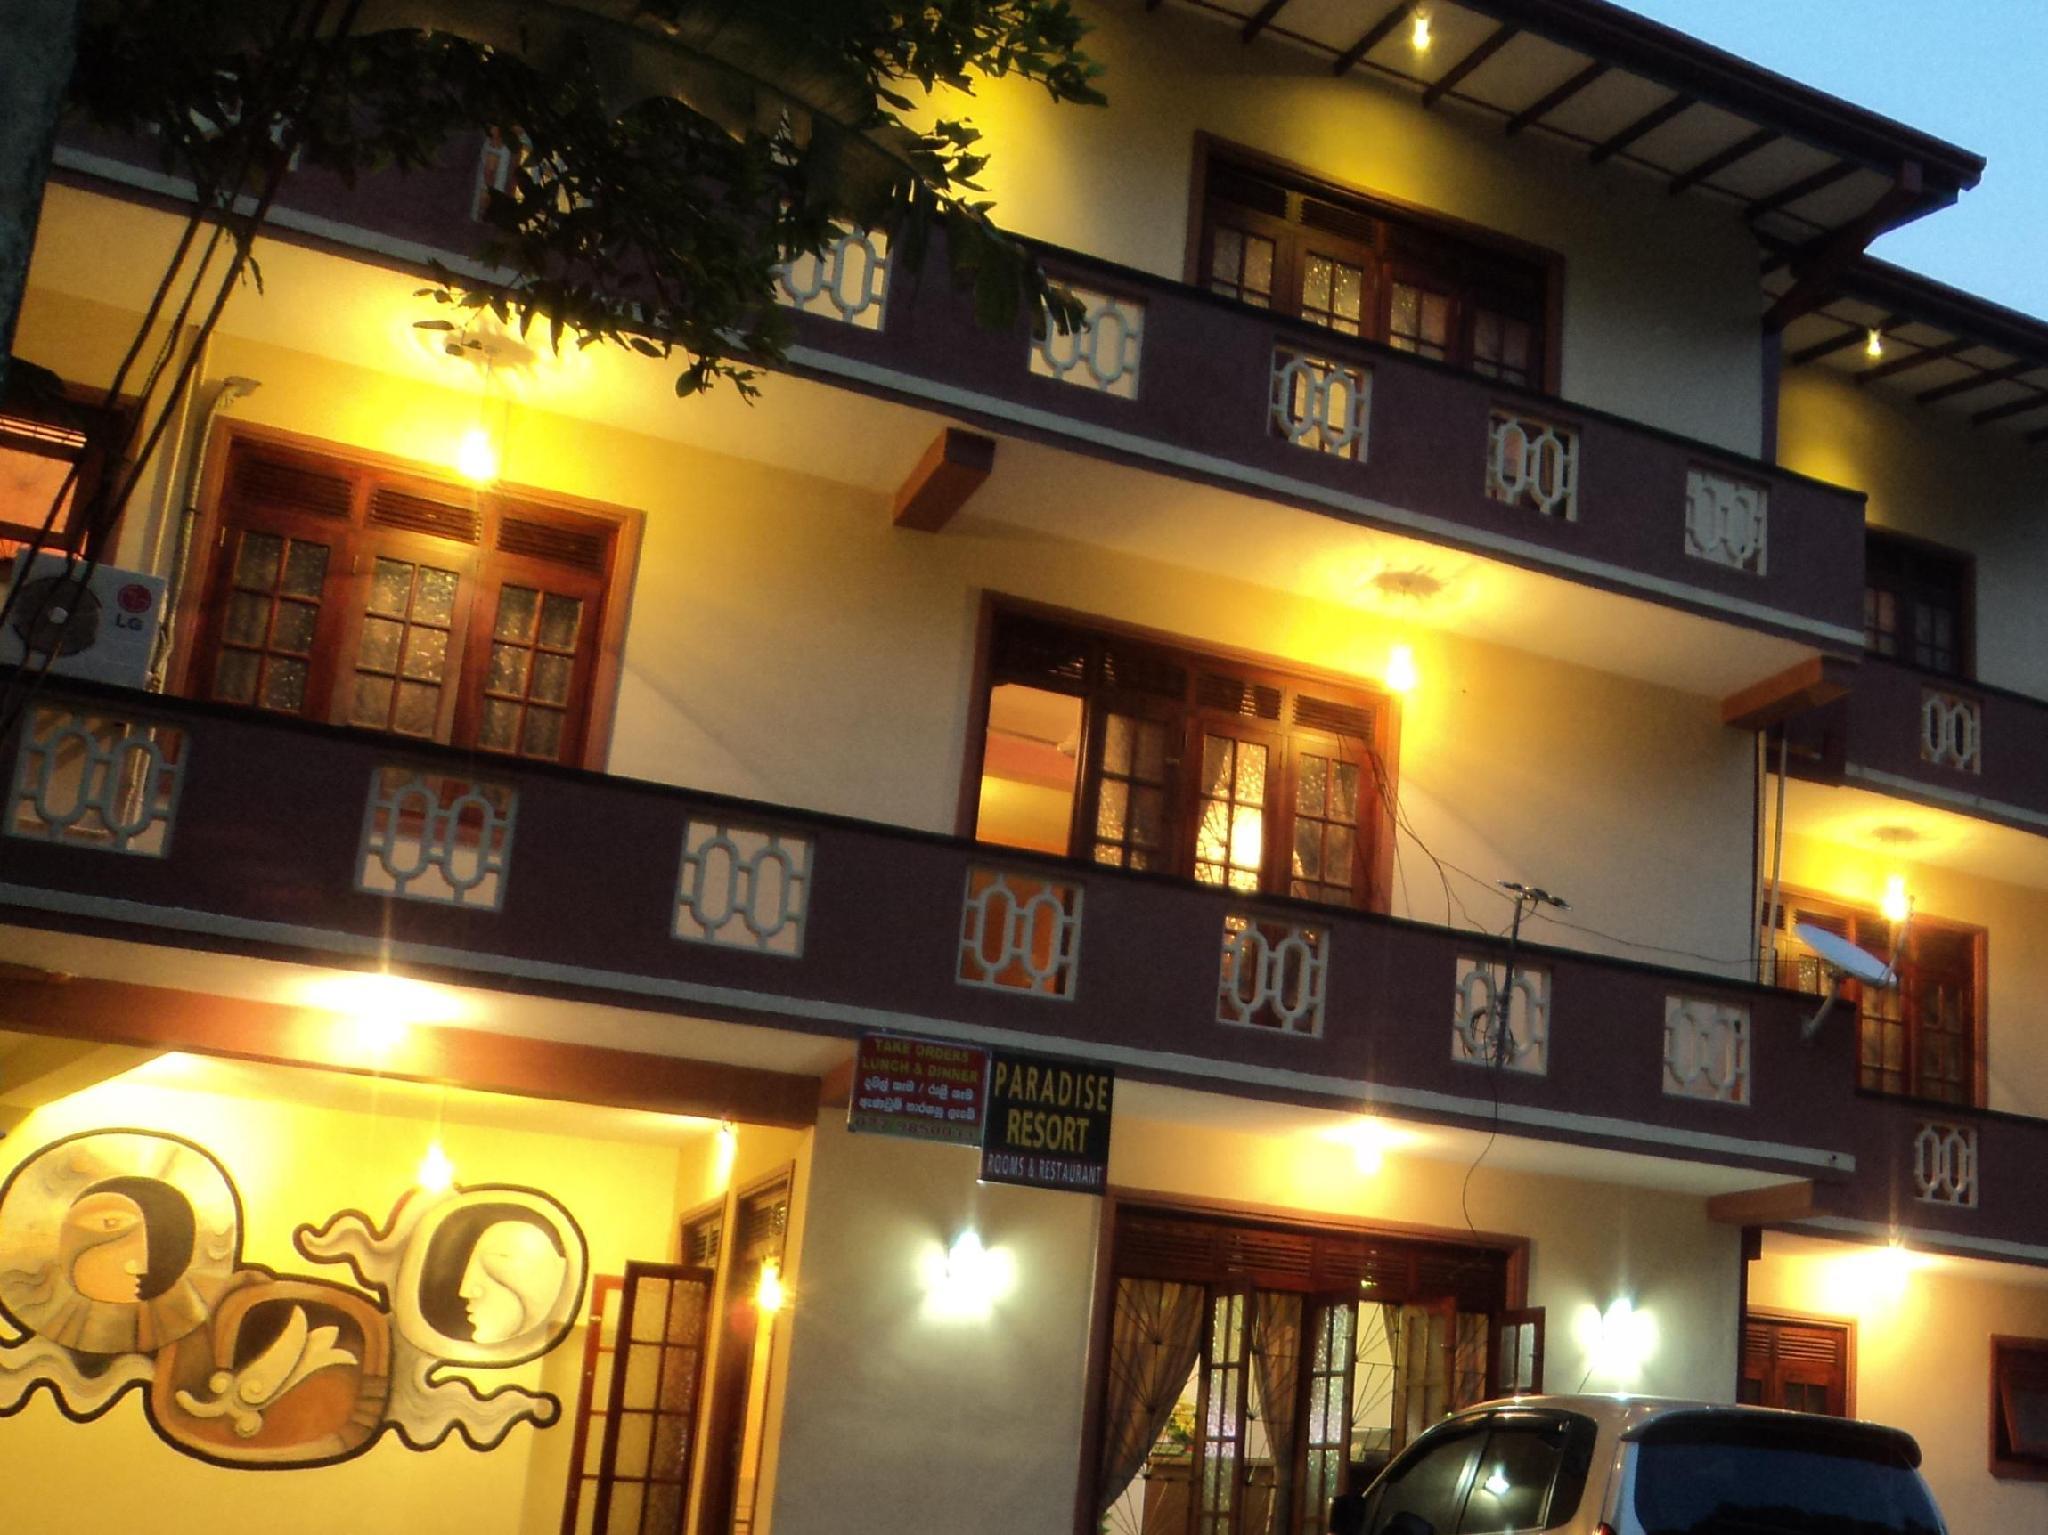 Kandy Paradise Resort